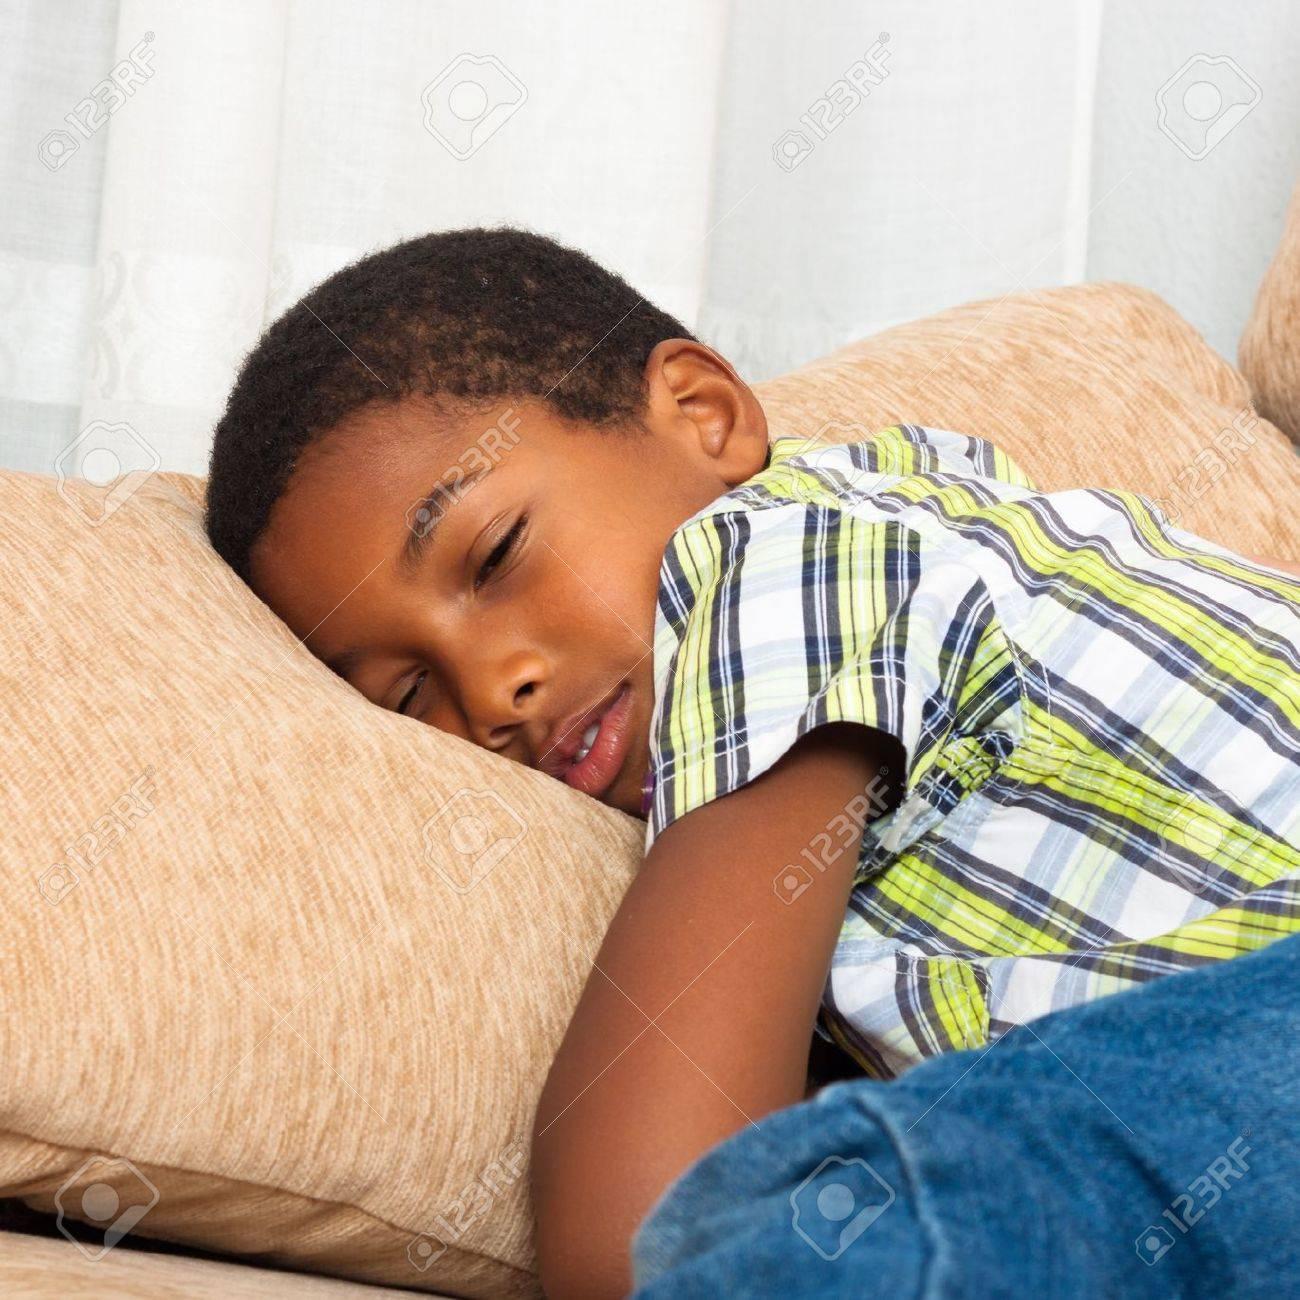 Close up of cute tired child boy sleeping on sofa. - 16960148